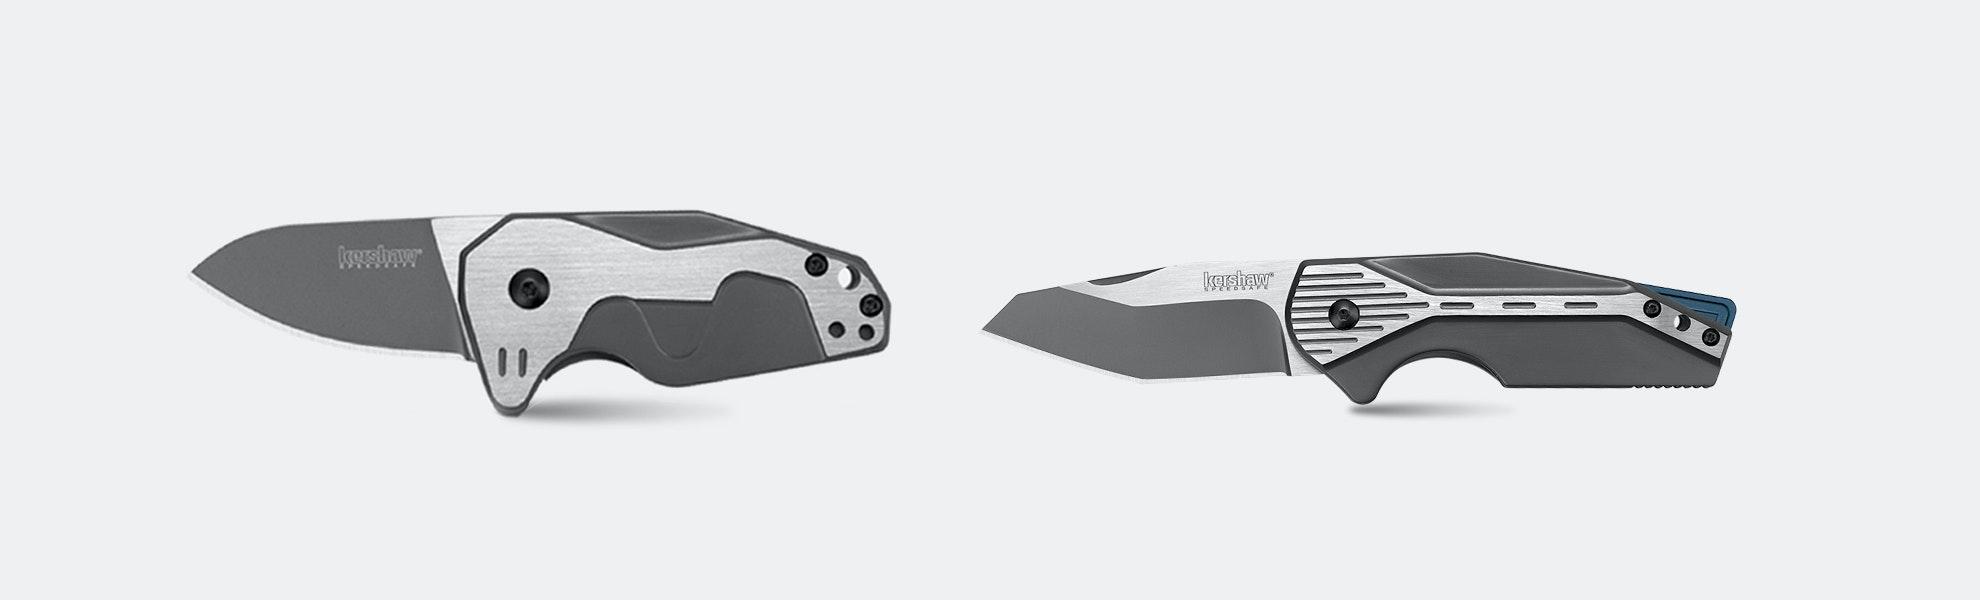 Kershaw Hops & Malt Assisted Folding Knives